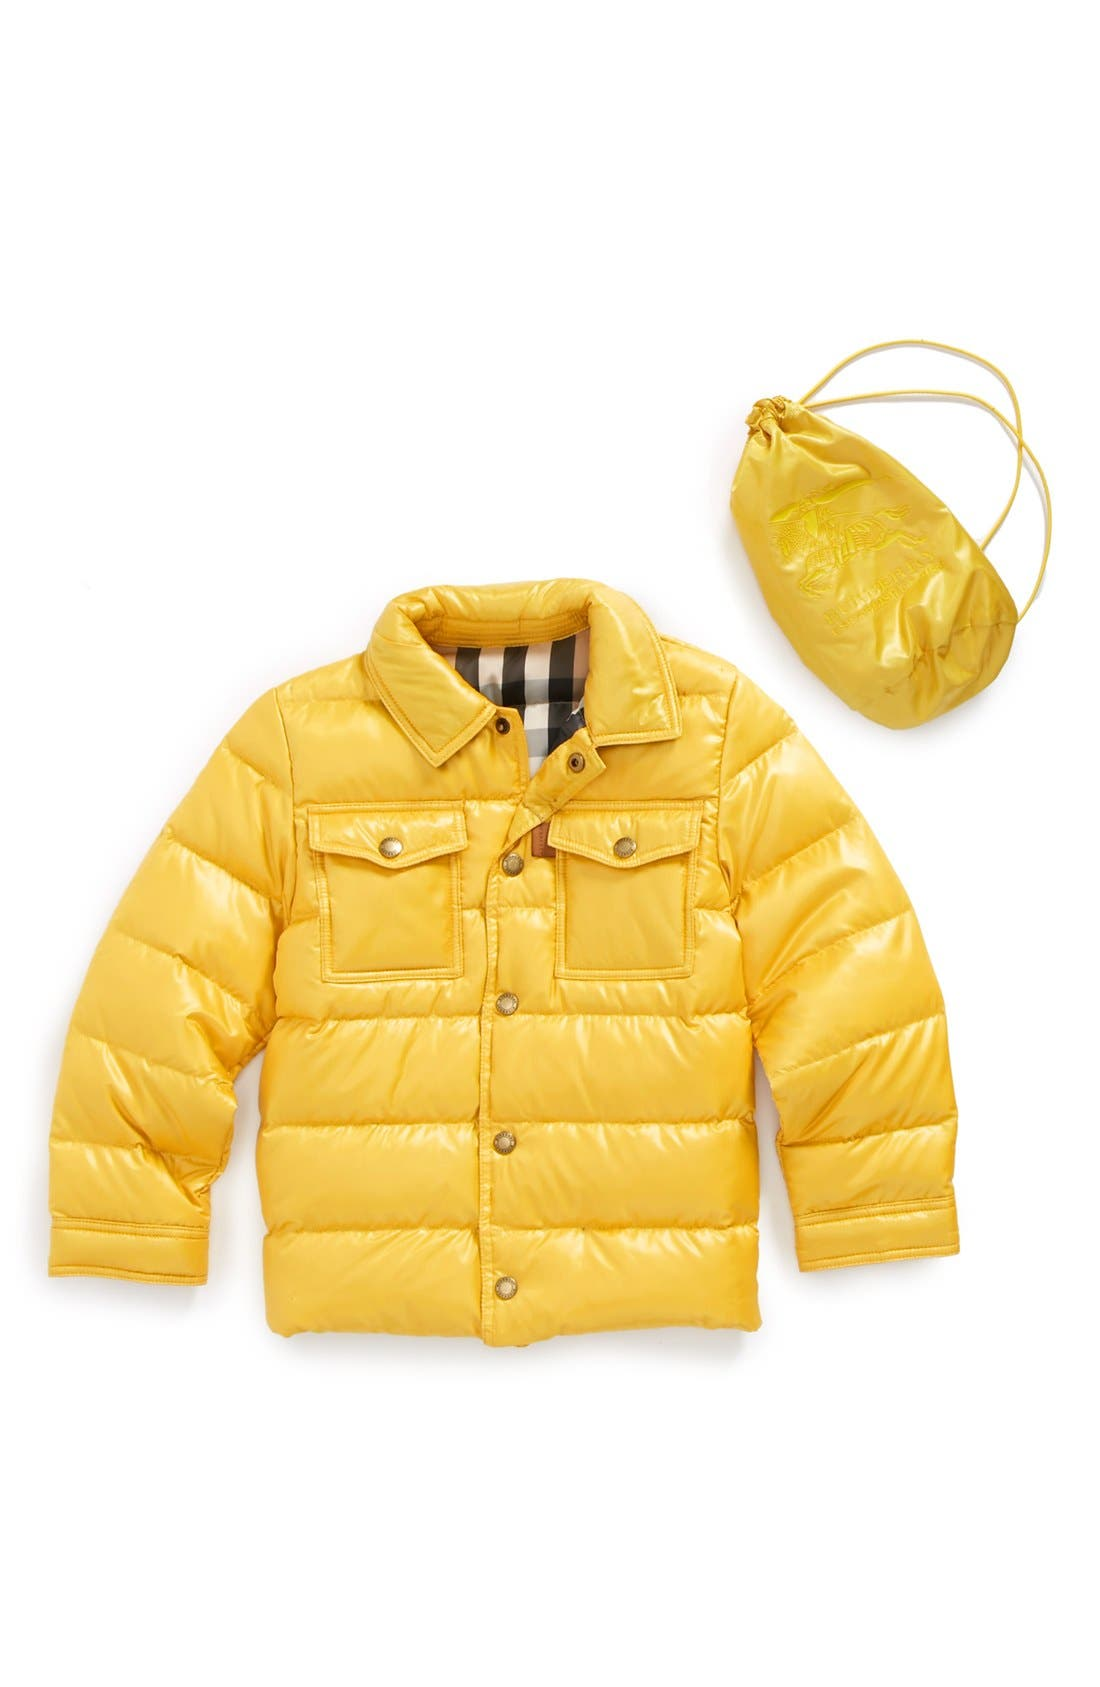 Alternate Image 1 Selected - Burberry Down Puffer Jacket (Toddler Boys, Little Boys & Big Boys)